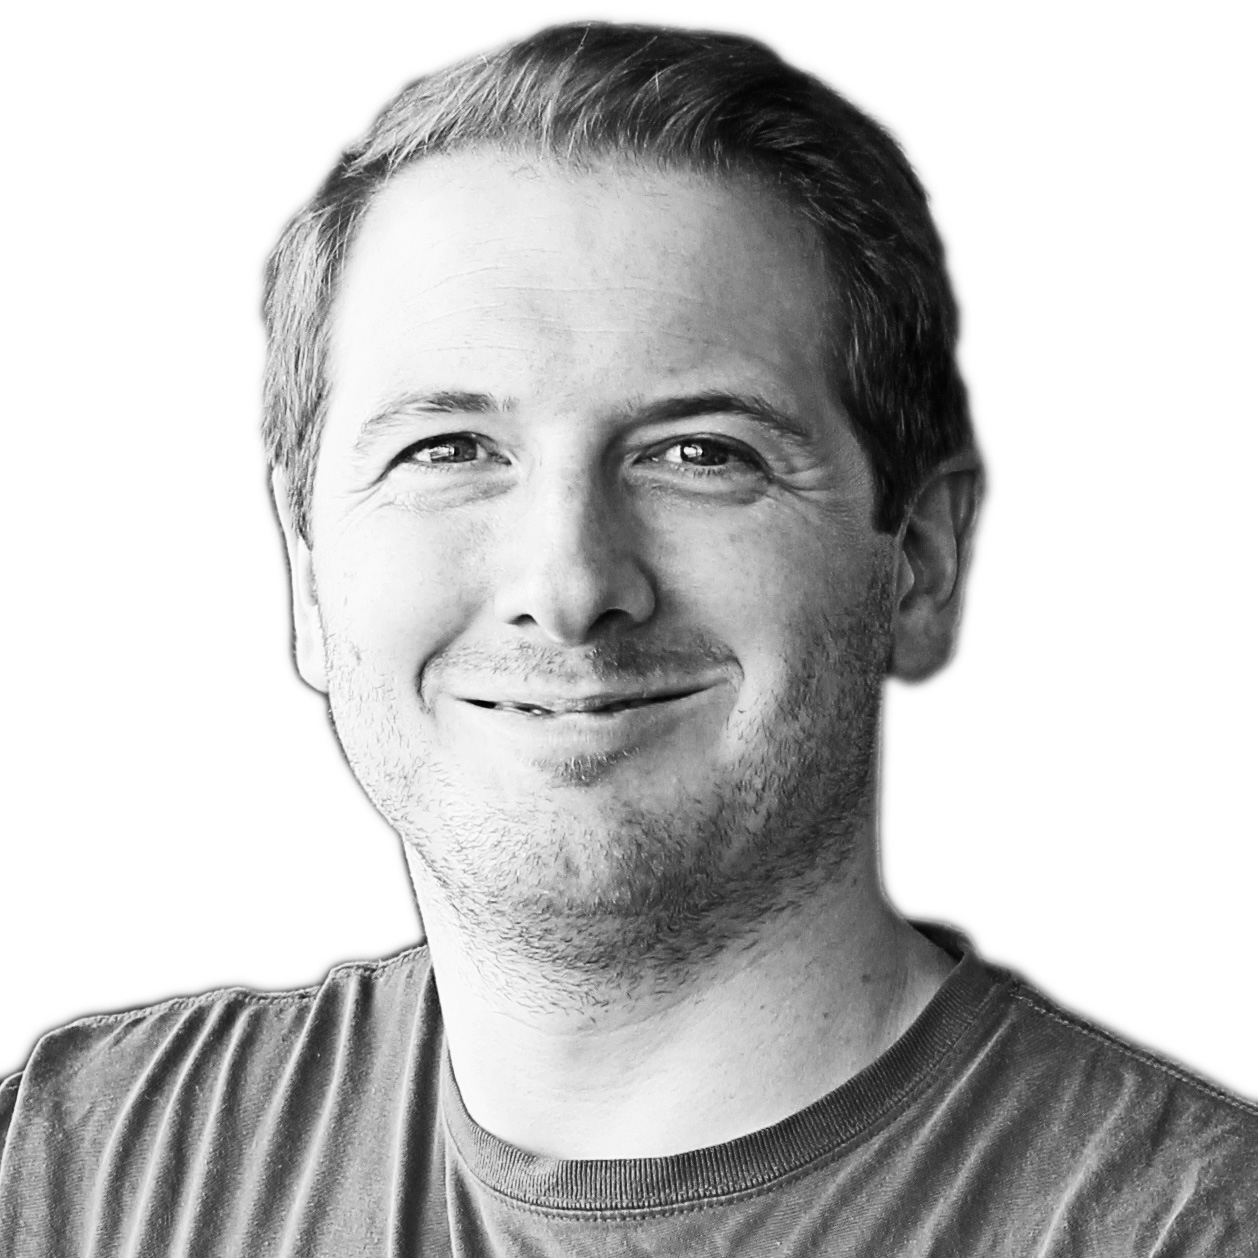 Alex Hinchliffe, Threat Intelligence Analyst